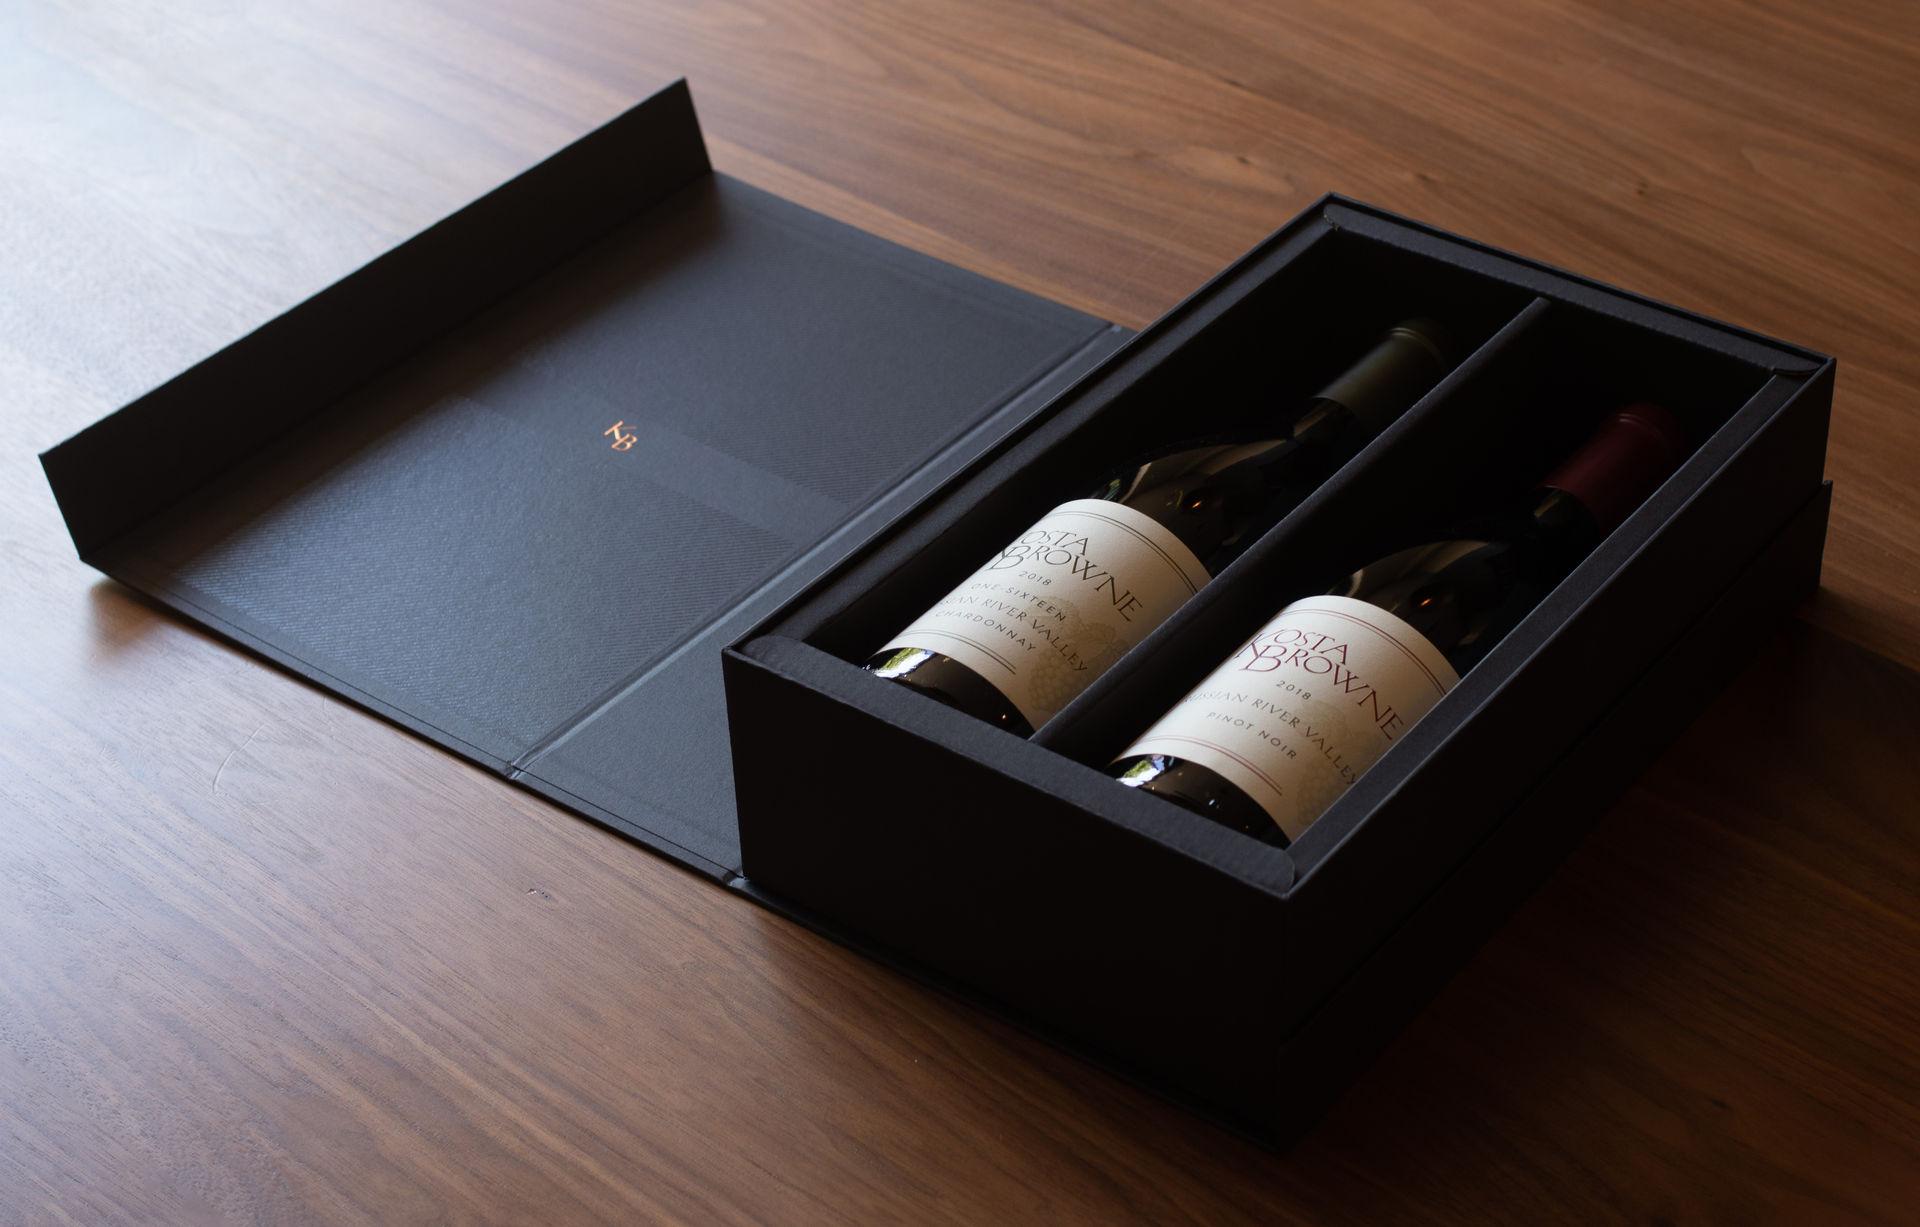 Kosta Browne Gift Box